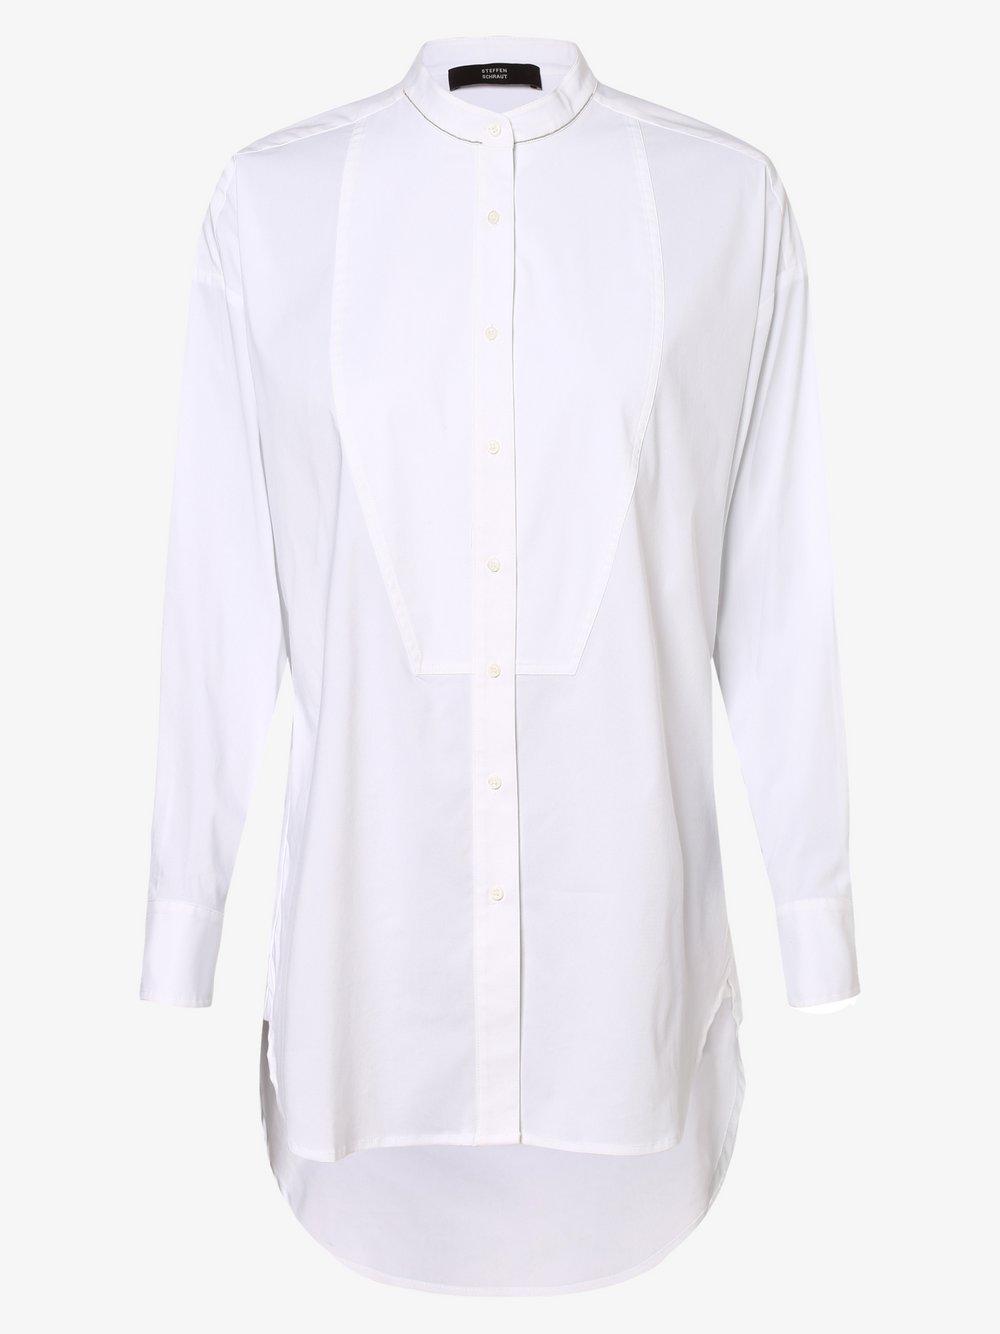 STEFFEN SCHRAUT – Bluzka damska, biały Van Graaf 479479-0001-00420